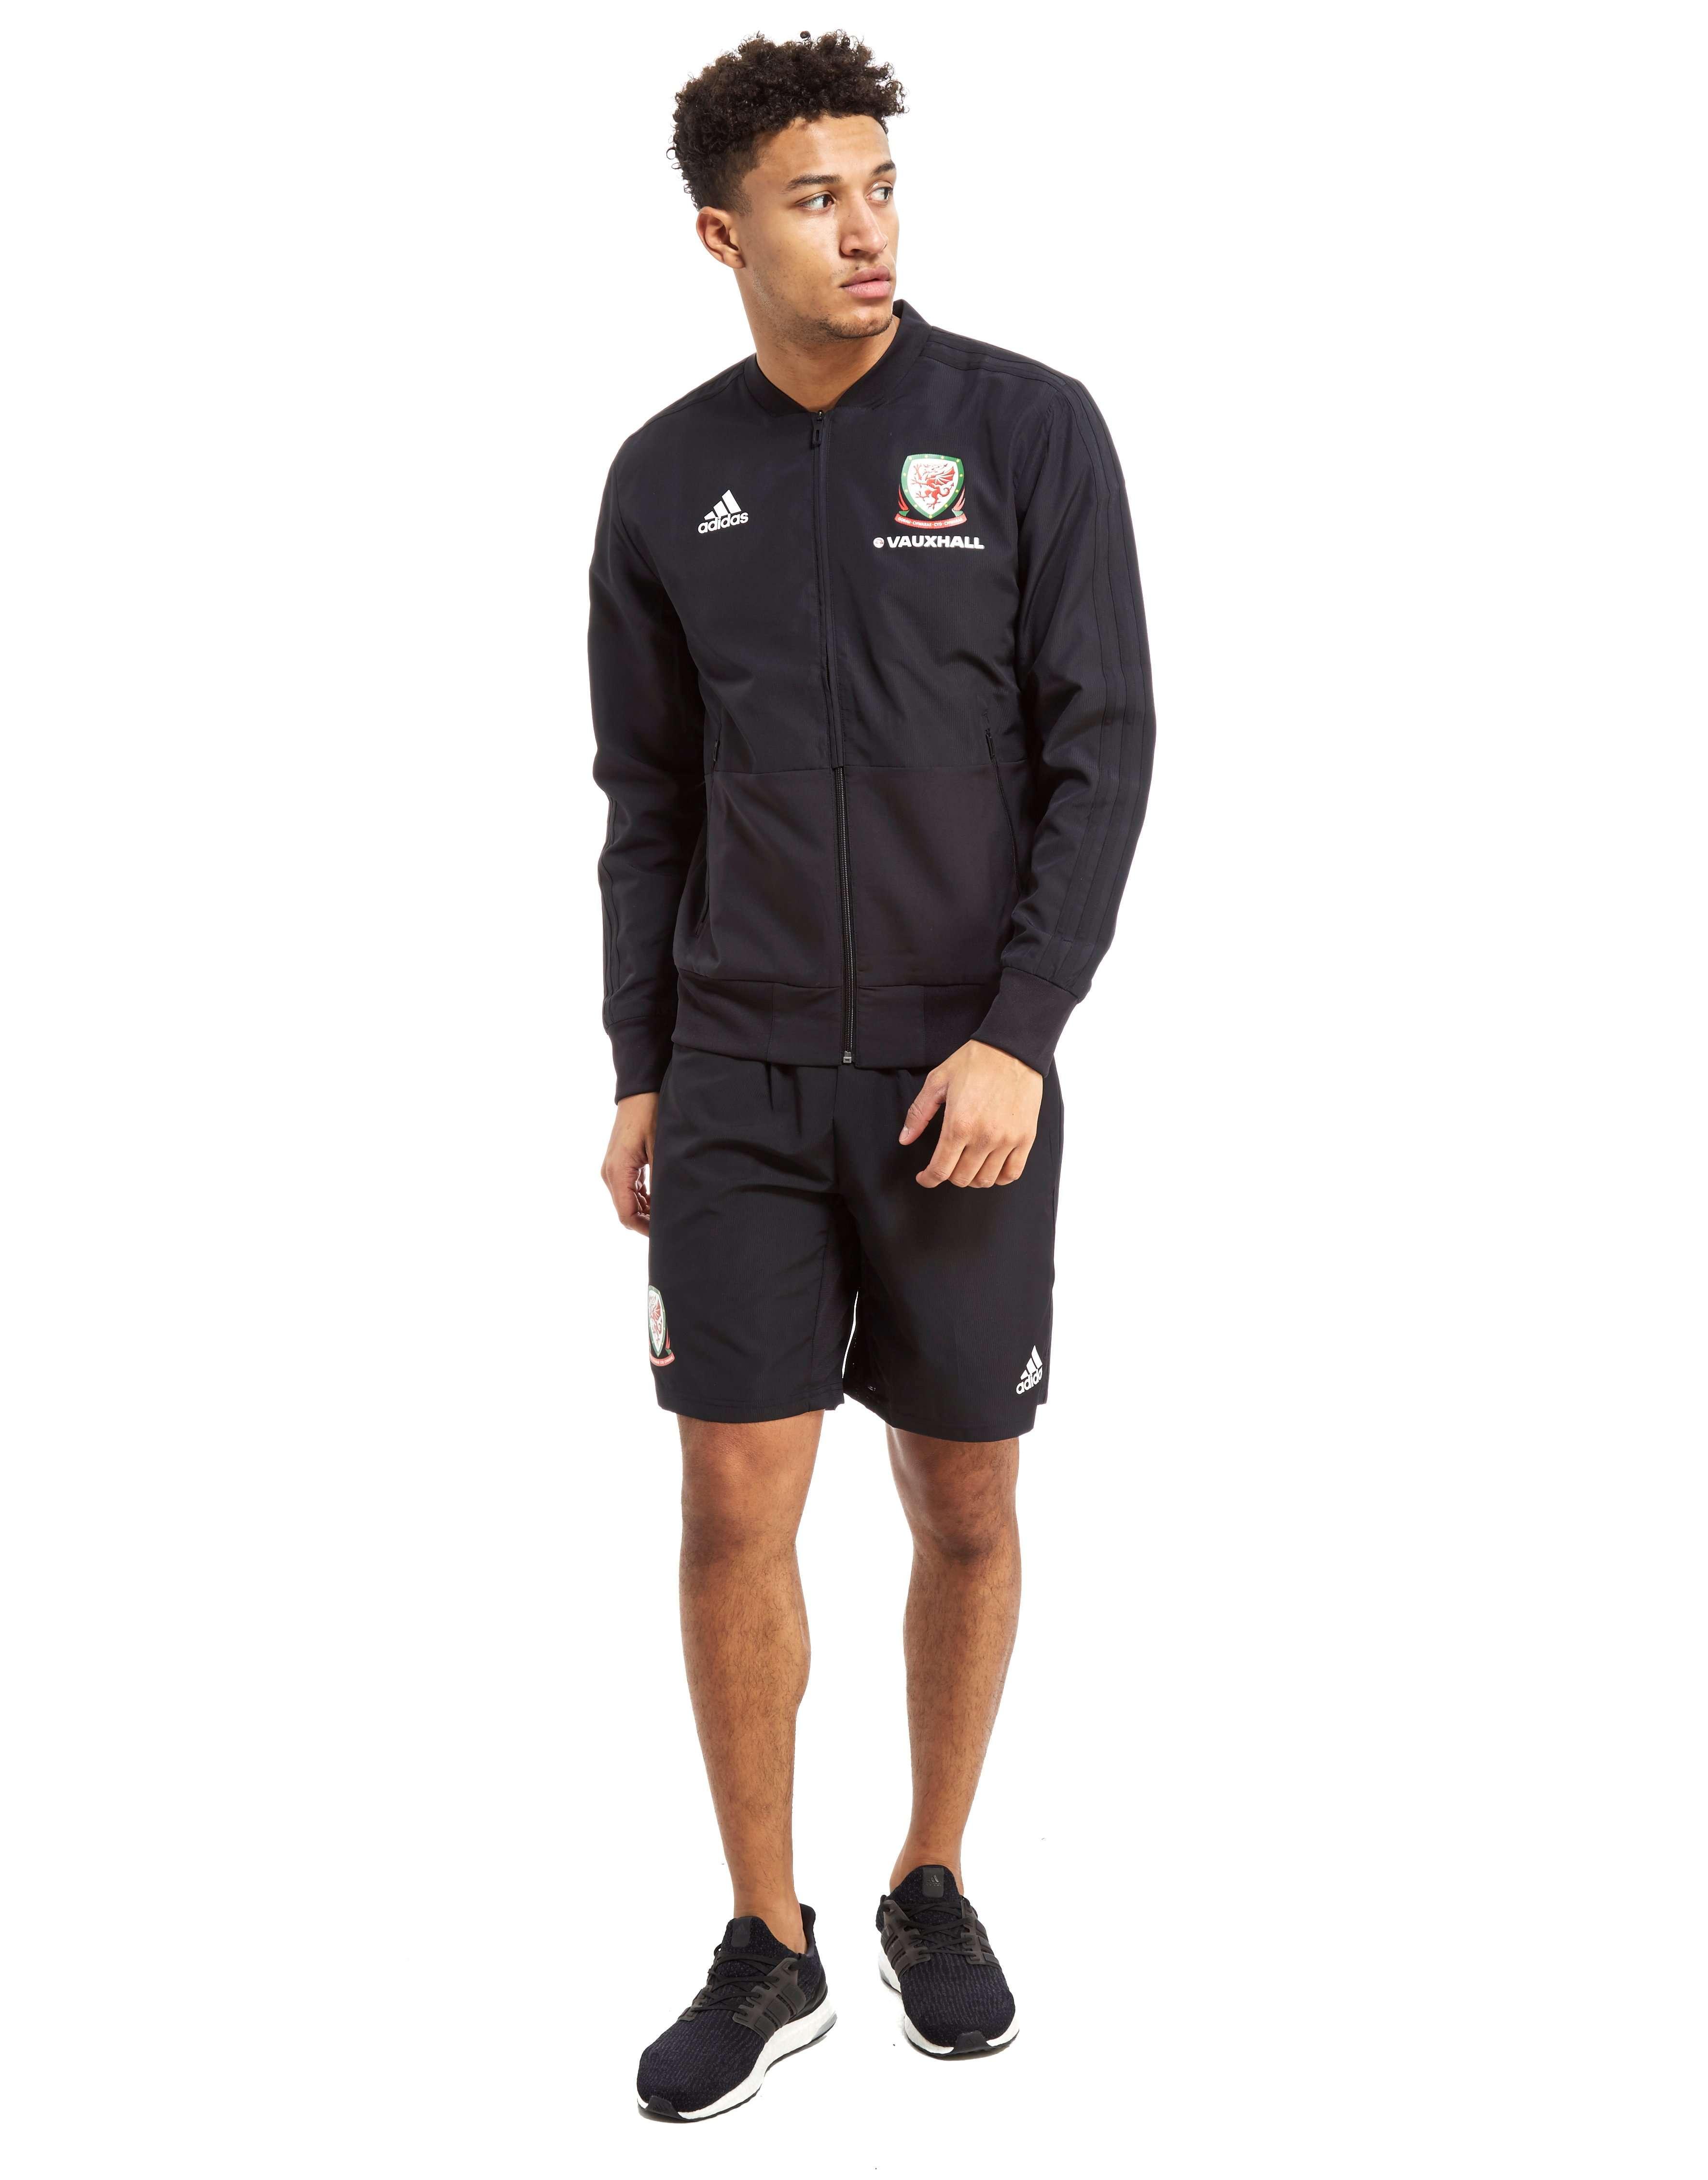 adidas FA Wales 2018/19 Presentation Jacket